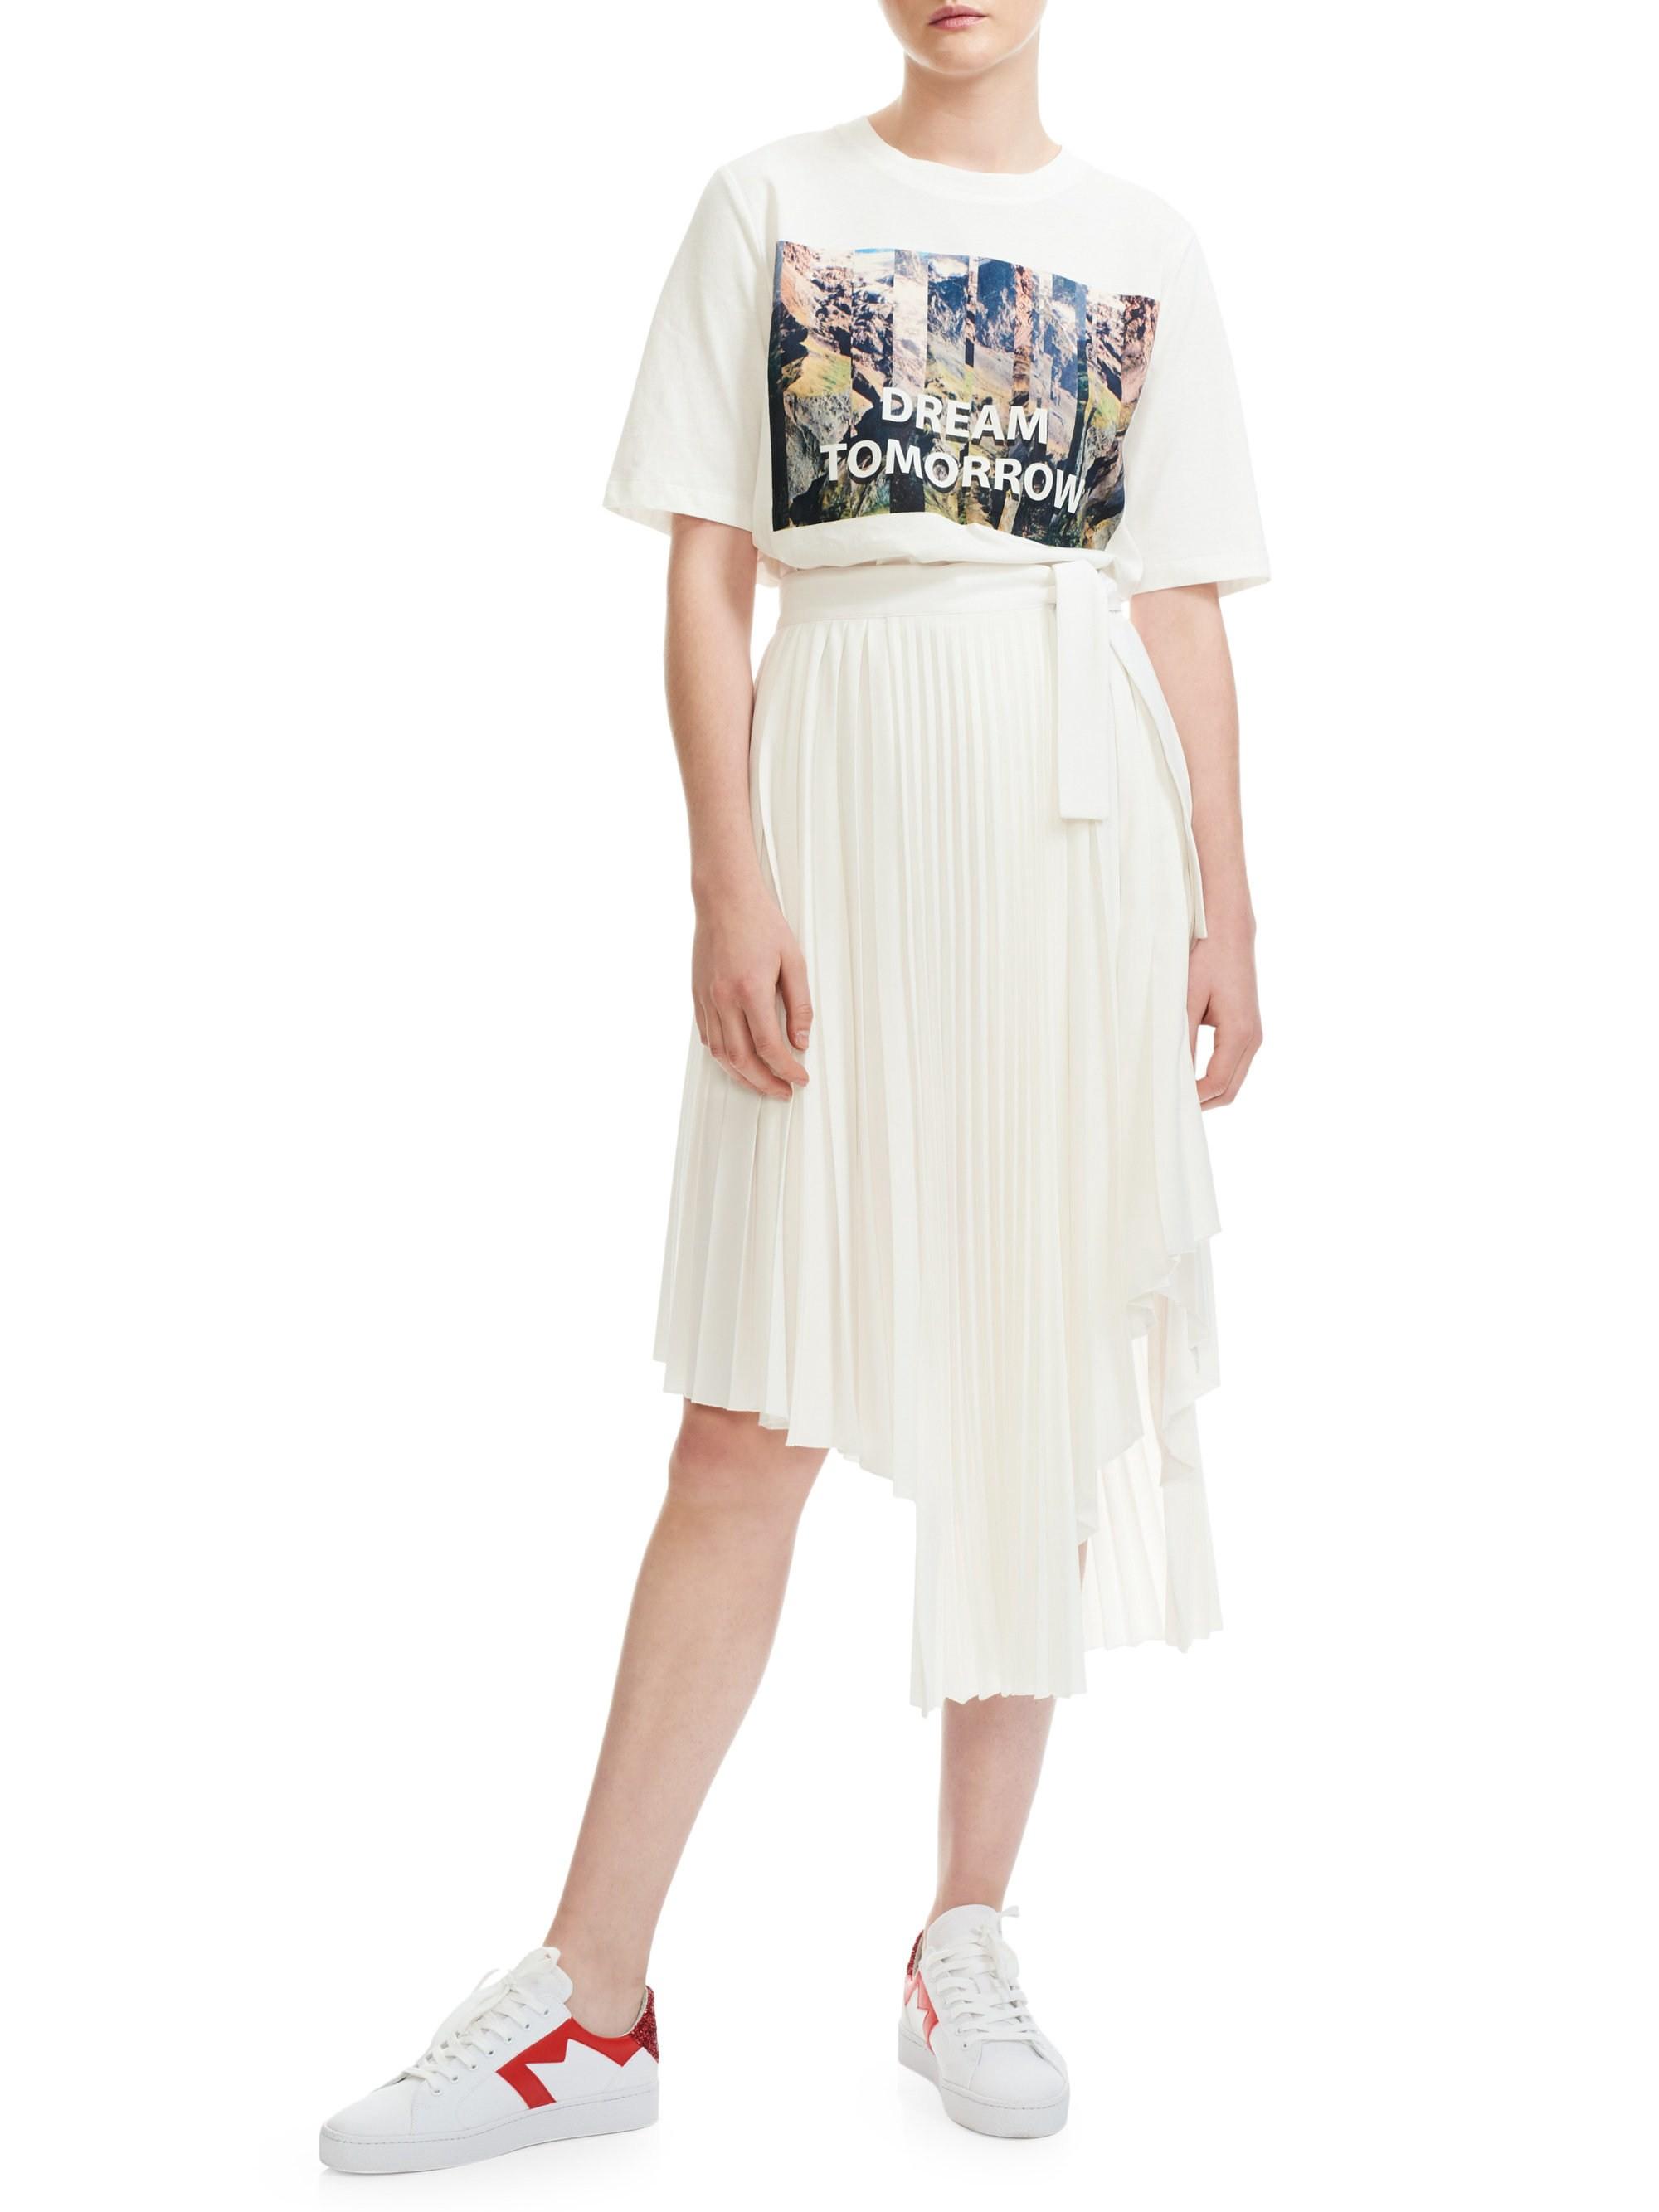 7c2ef2b137 Maje Asymmetrical Pleated Wrap Skirt - White 36 (4) in 2019 ...